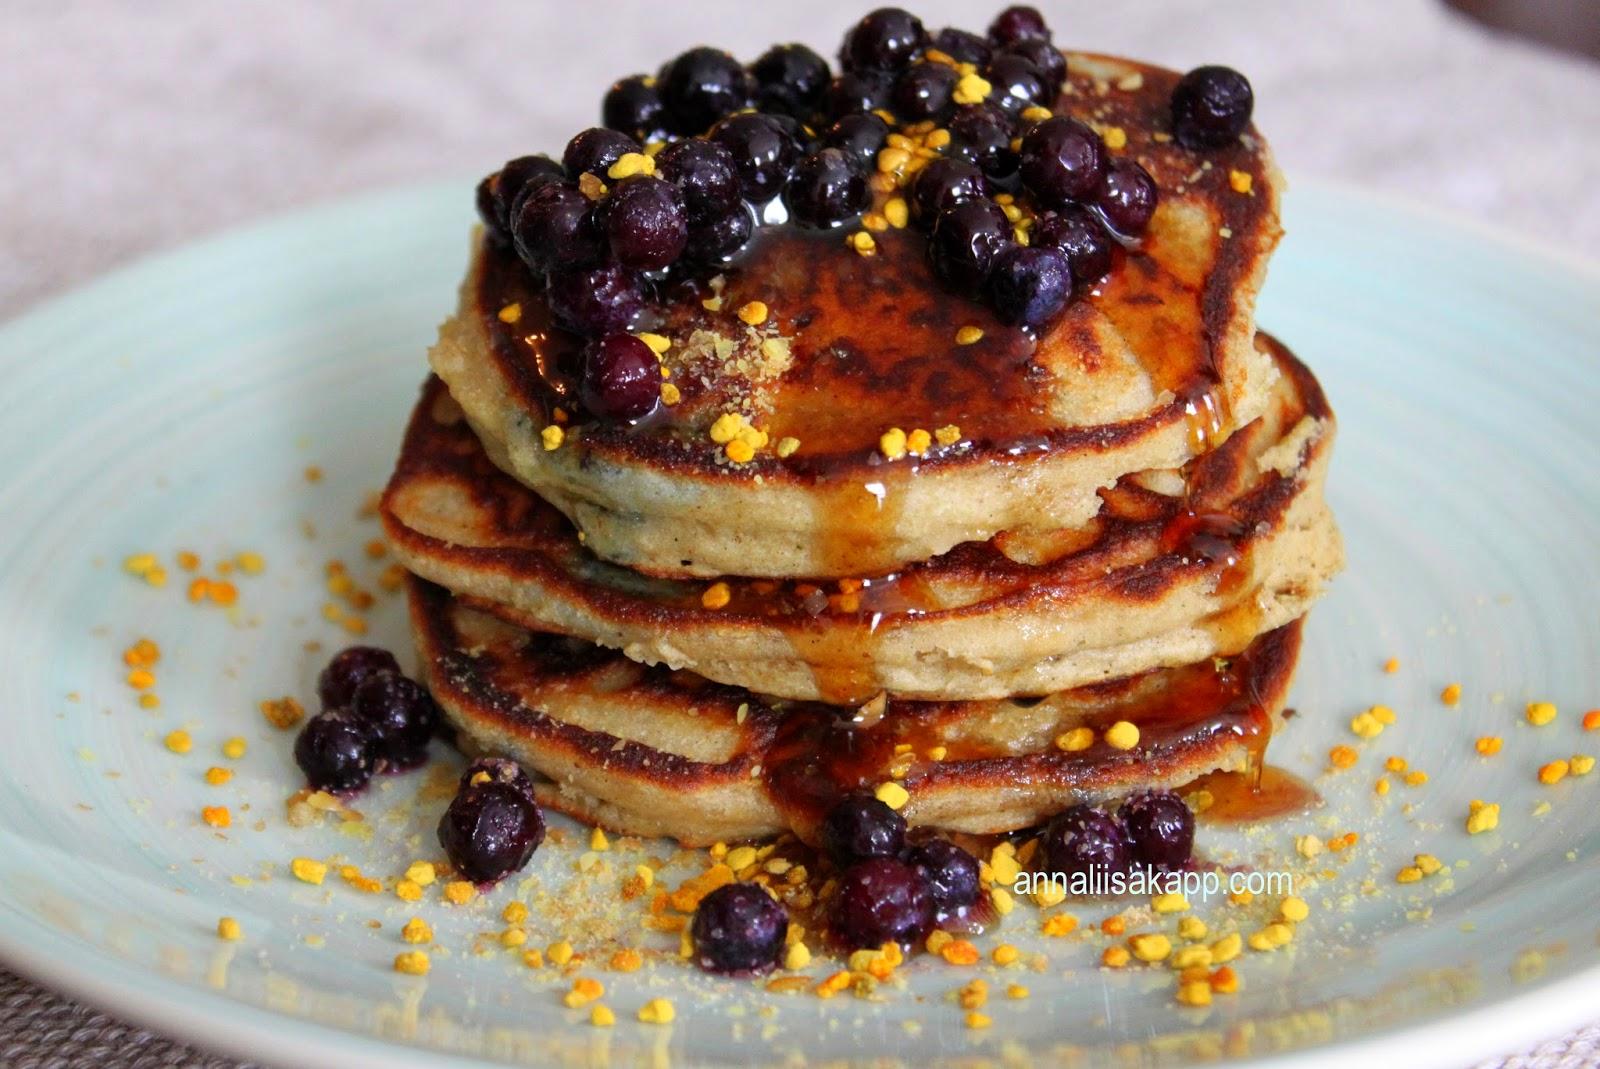 Grain-free coconut flour blueberry pancakes - paleo